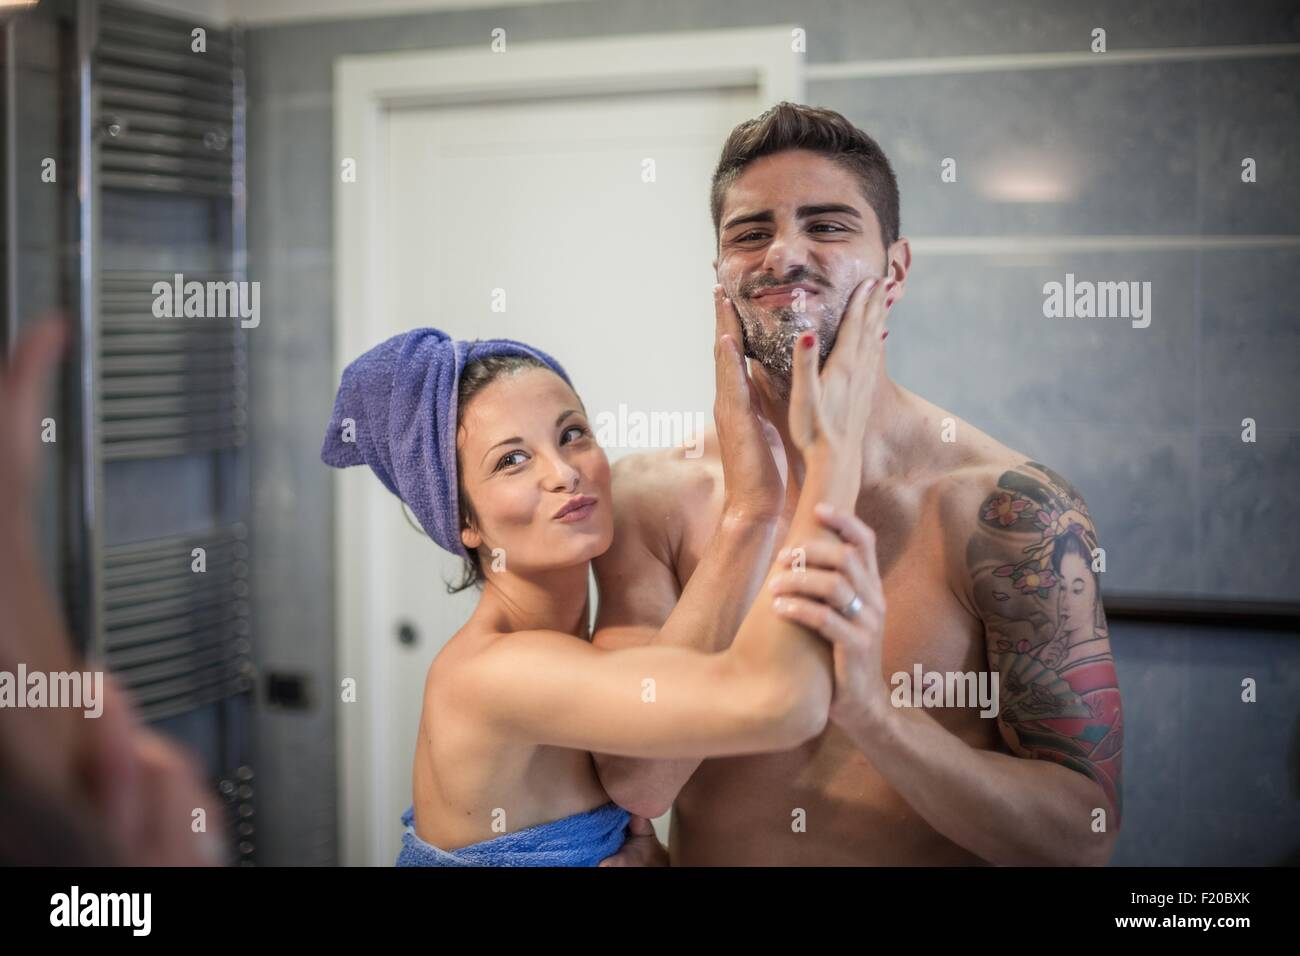 Bathroom mirror image of young woman applying shaving lotion to boyfriends cheeks - Stock Image